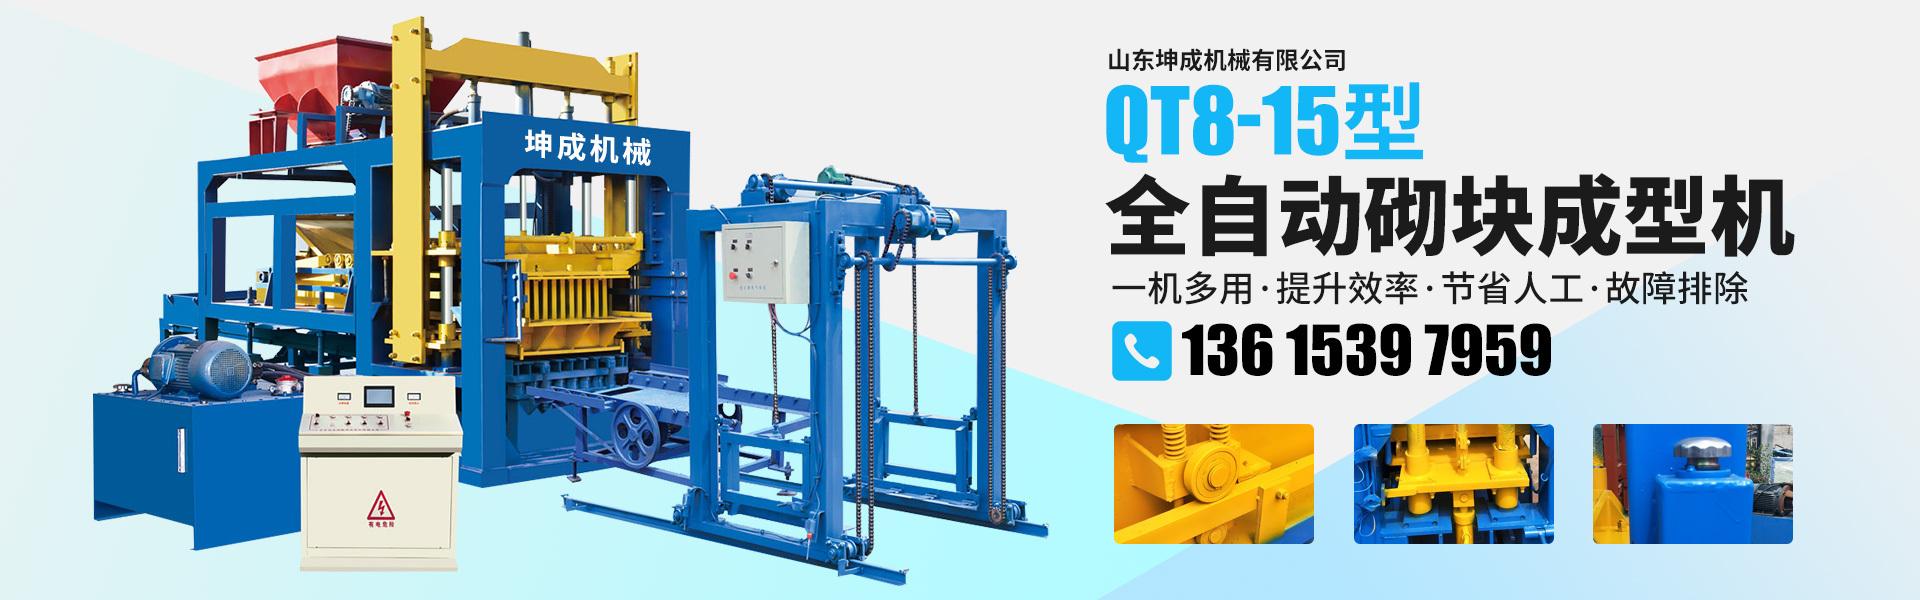 zhuazhuan机厂家,zhuan机模具配件,临沂码垛机,shui泥zhuan机直销